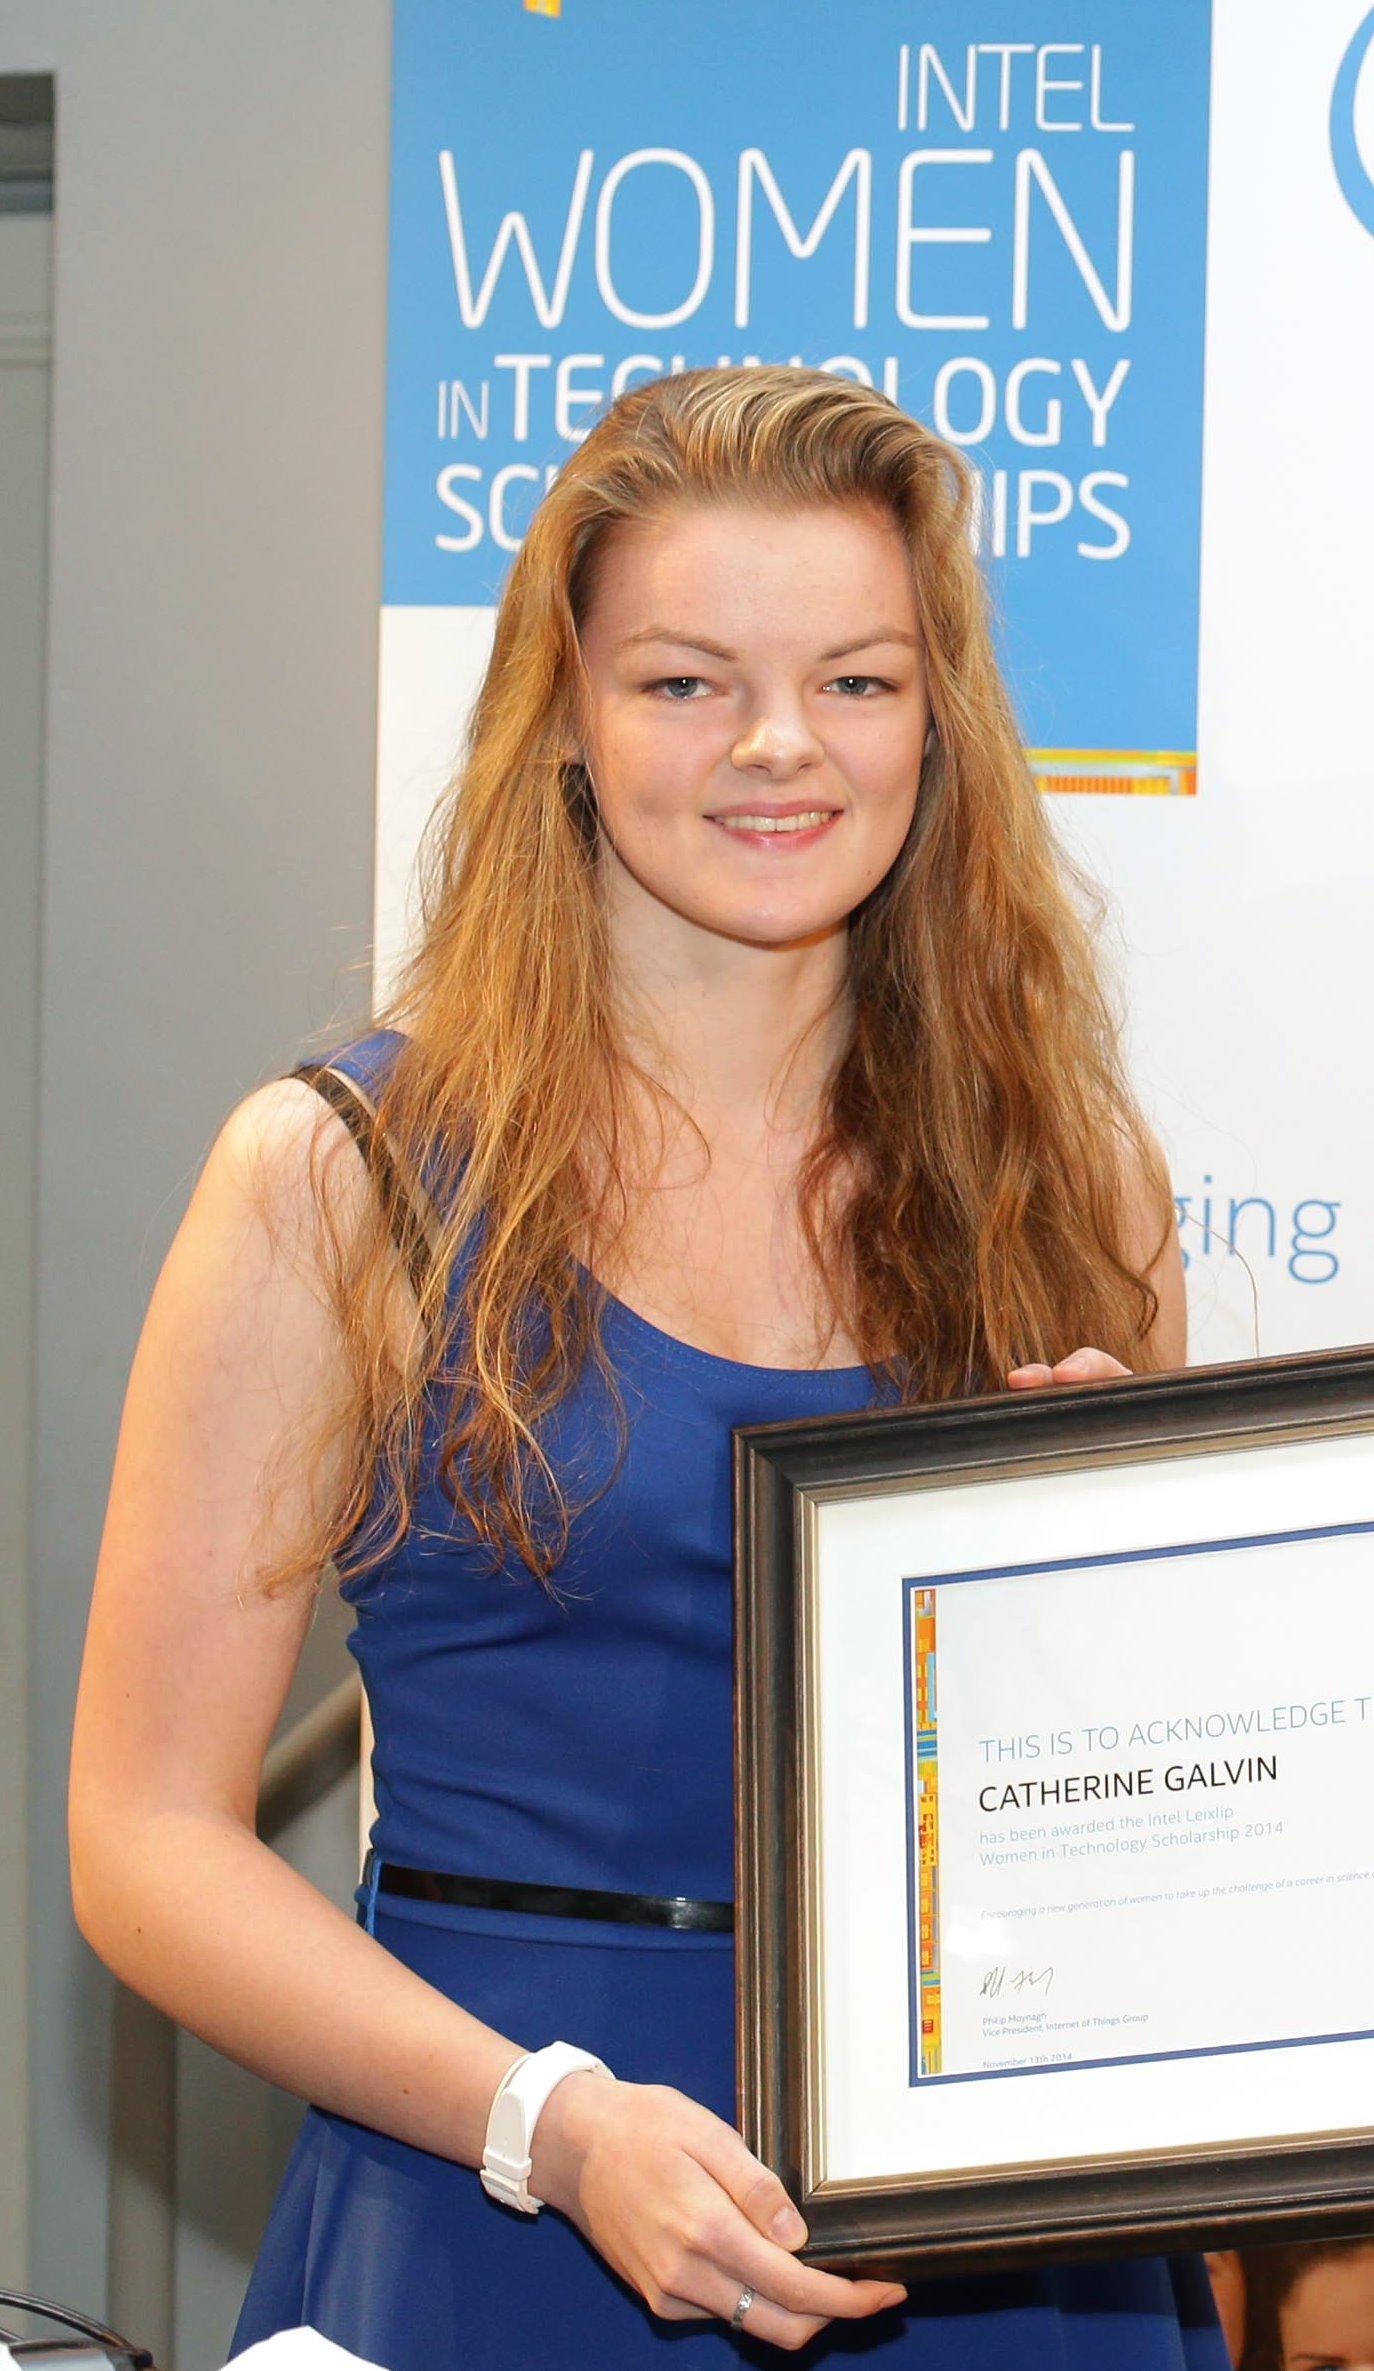 Catherine Galvin